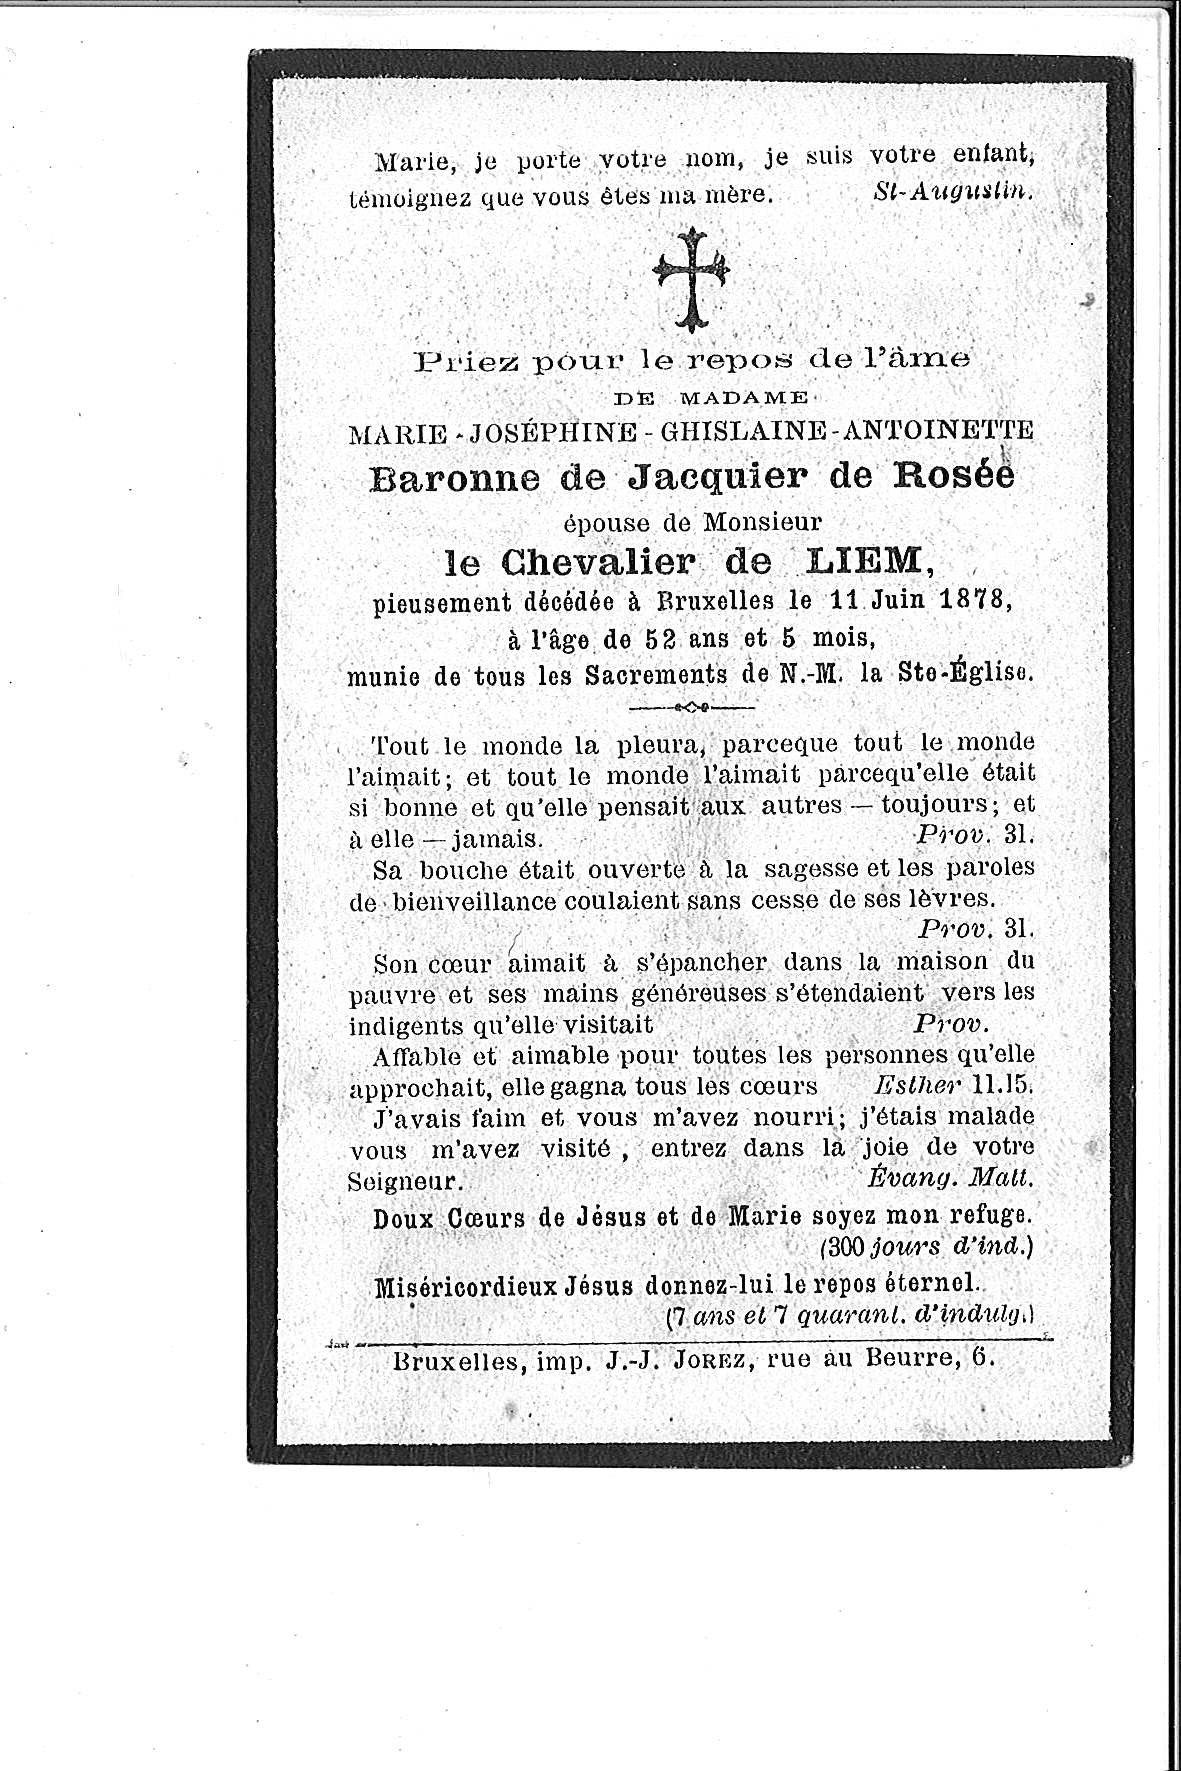 Marie-Joséphine-Ghislaine-Antoinette(1878)20150422085139_00014.jpg